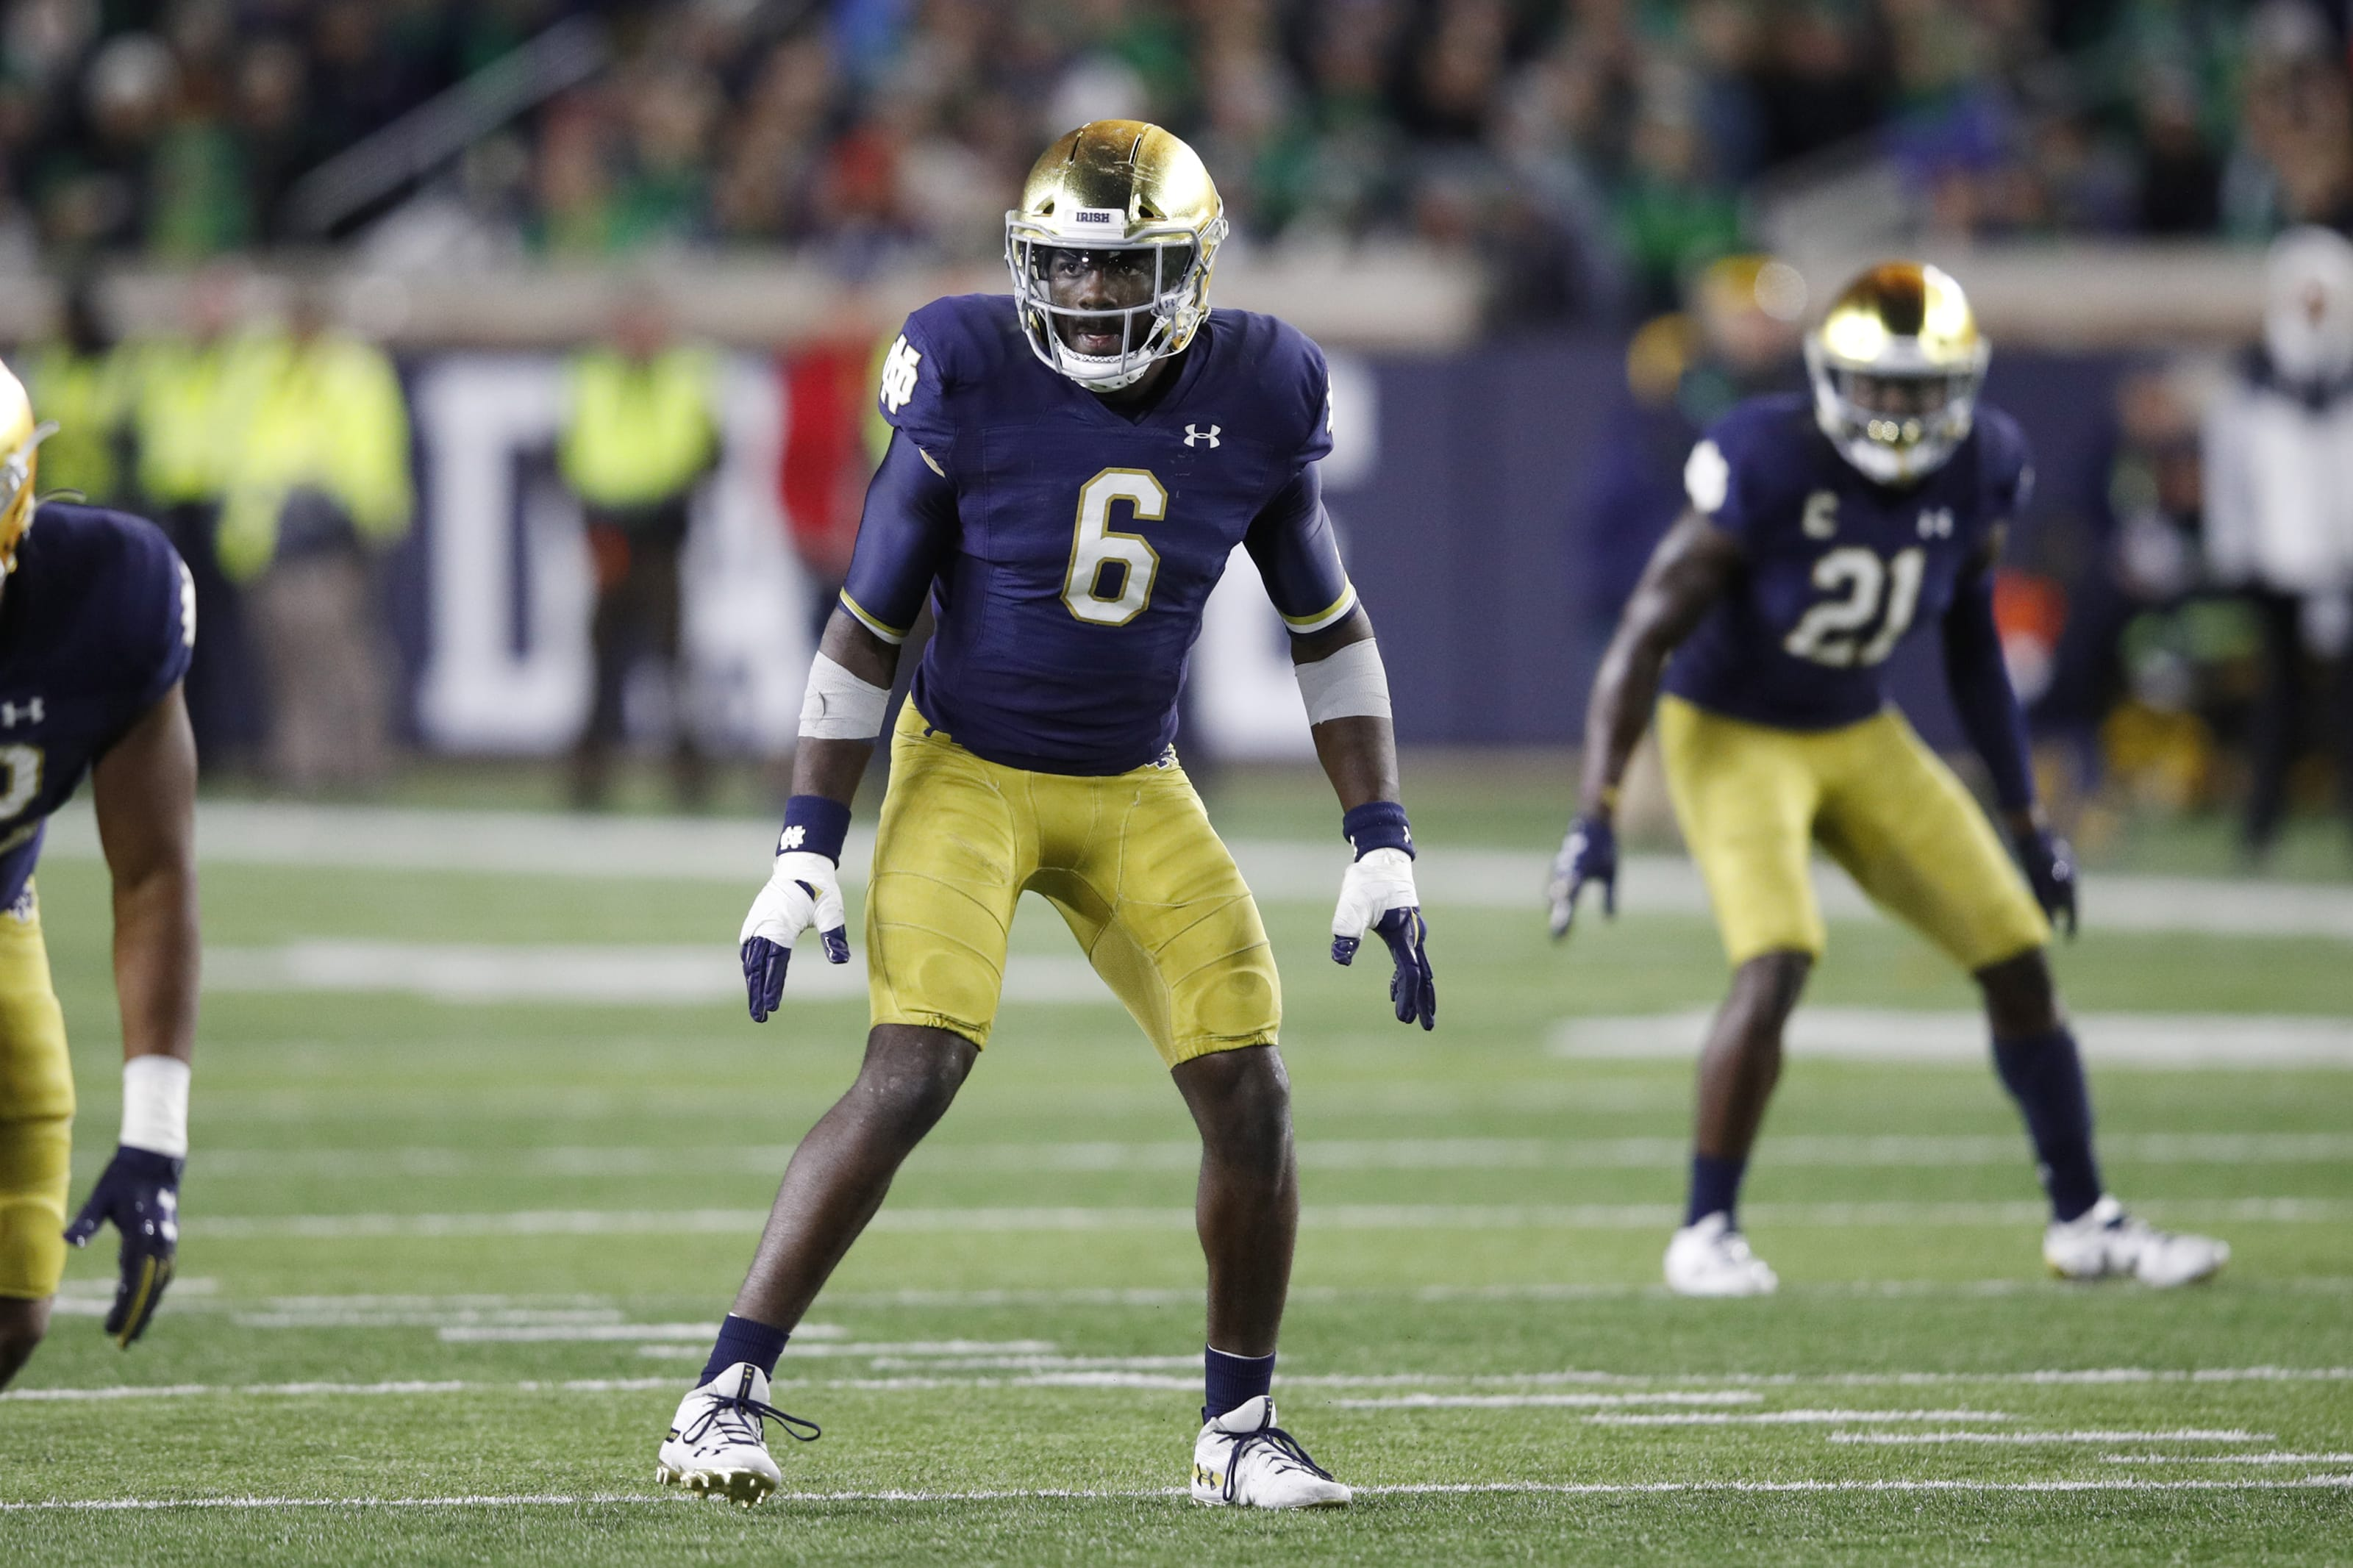 Notre Dame football: 3 best landing spots for Jeremiah Owusu-Koramoah